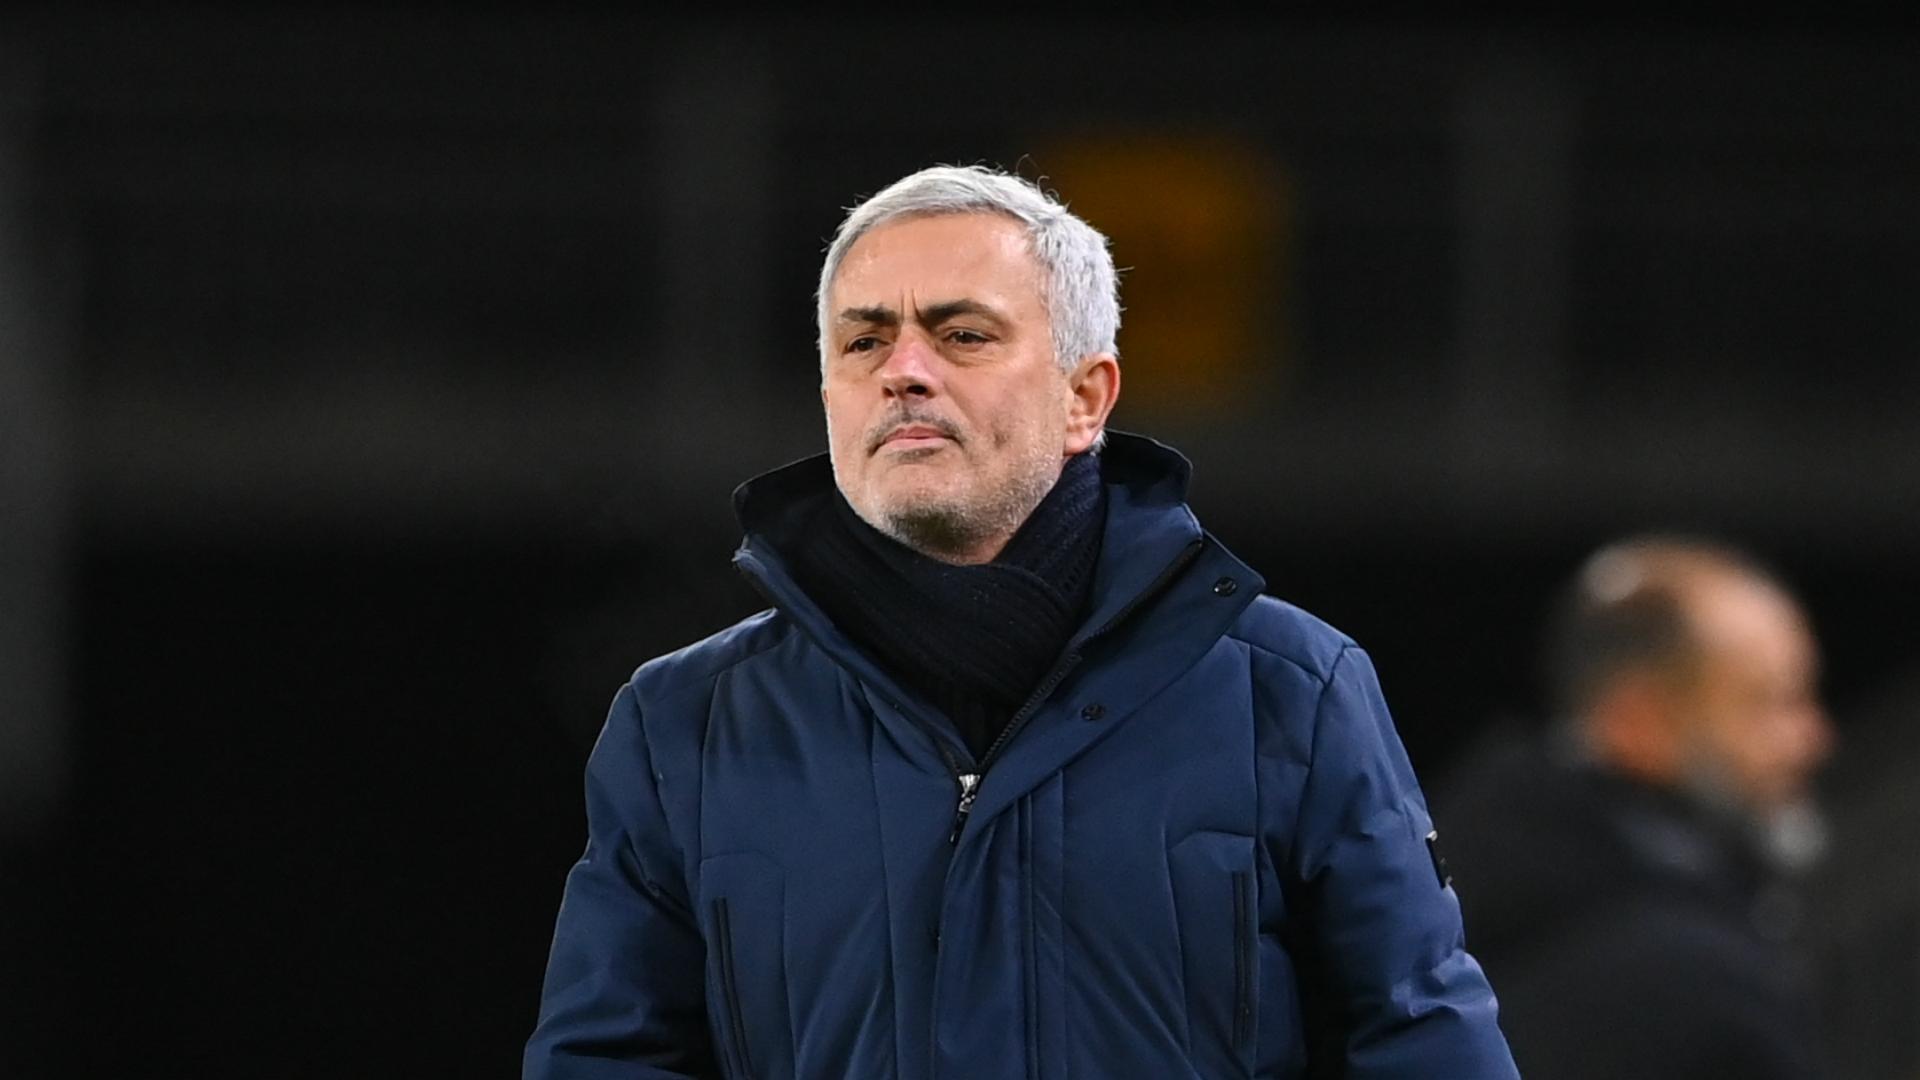 Tottenham's top-four hopes do not rest on Everton clash, insists Mourinho